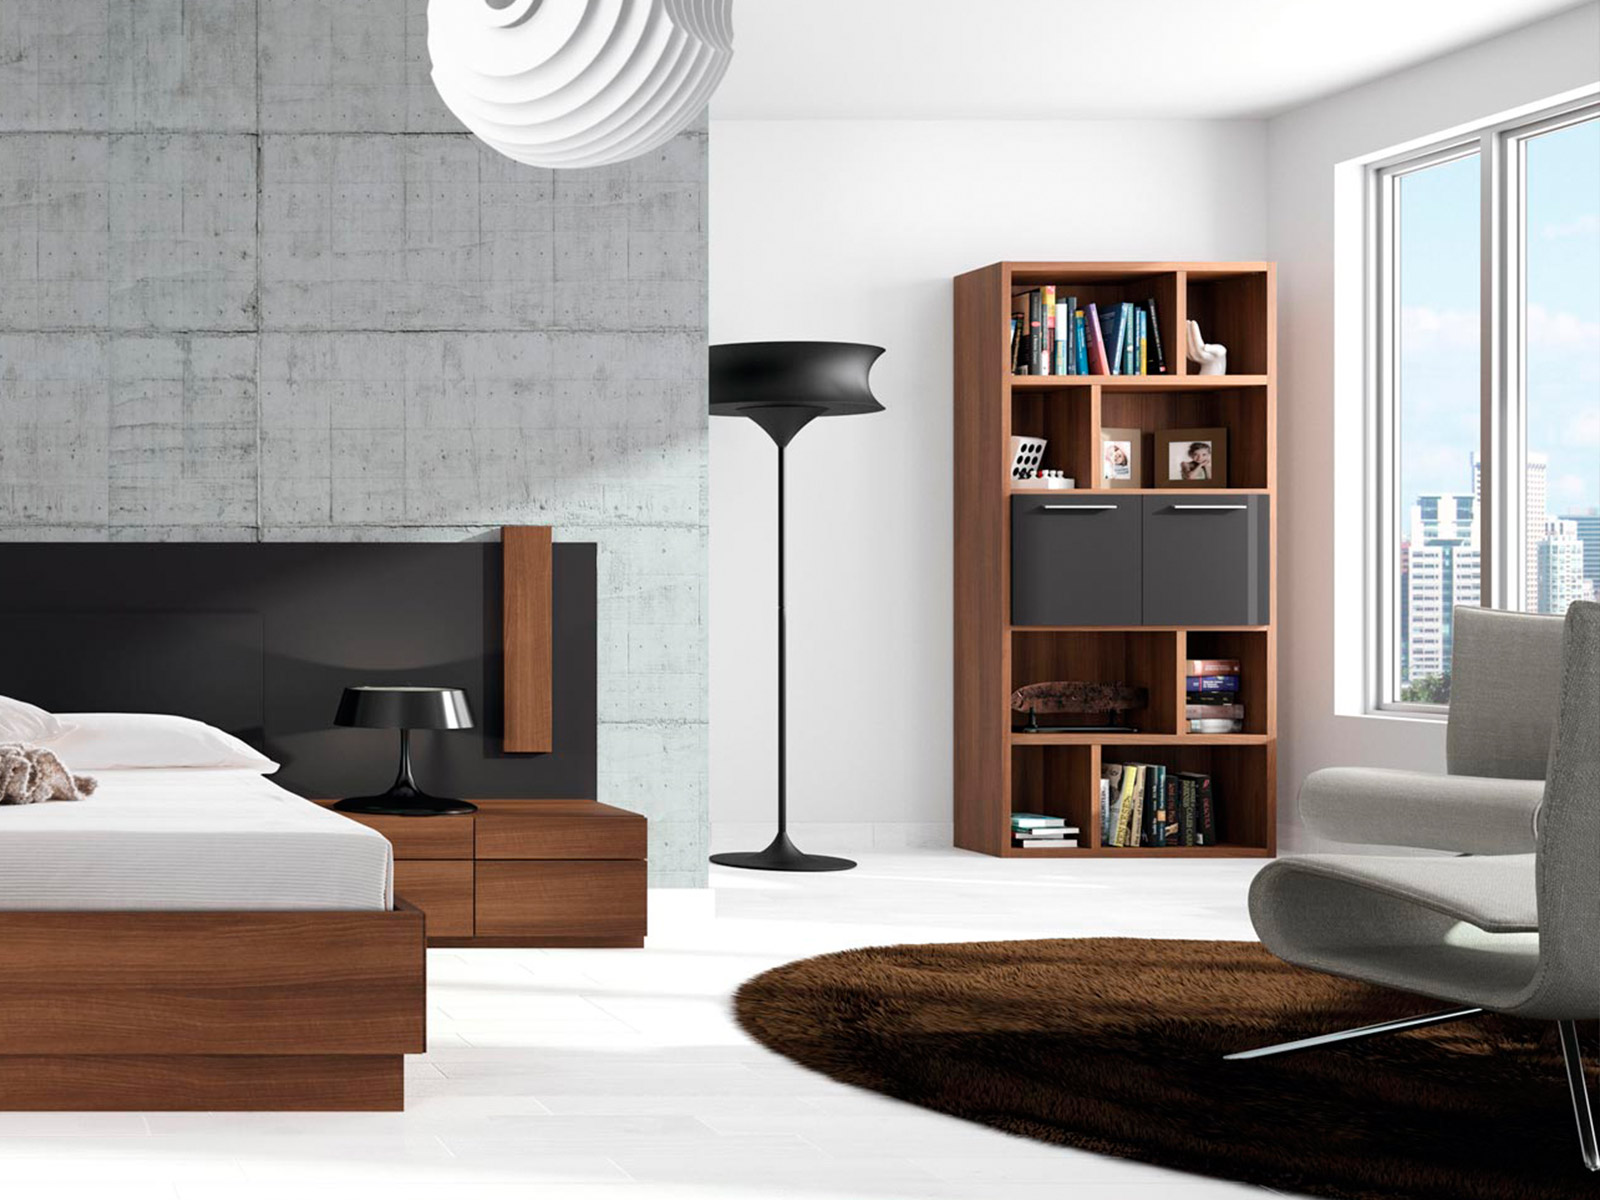 muebles barrag n queremos amueblar tu hogar